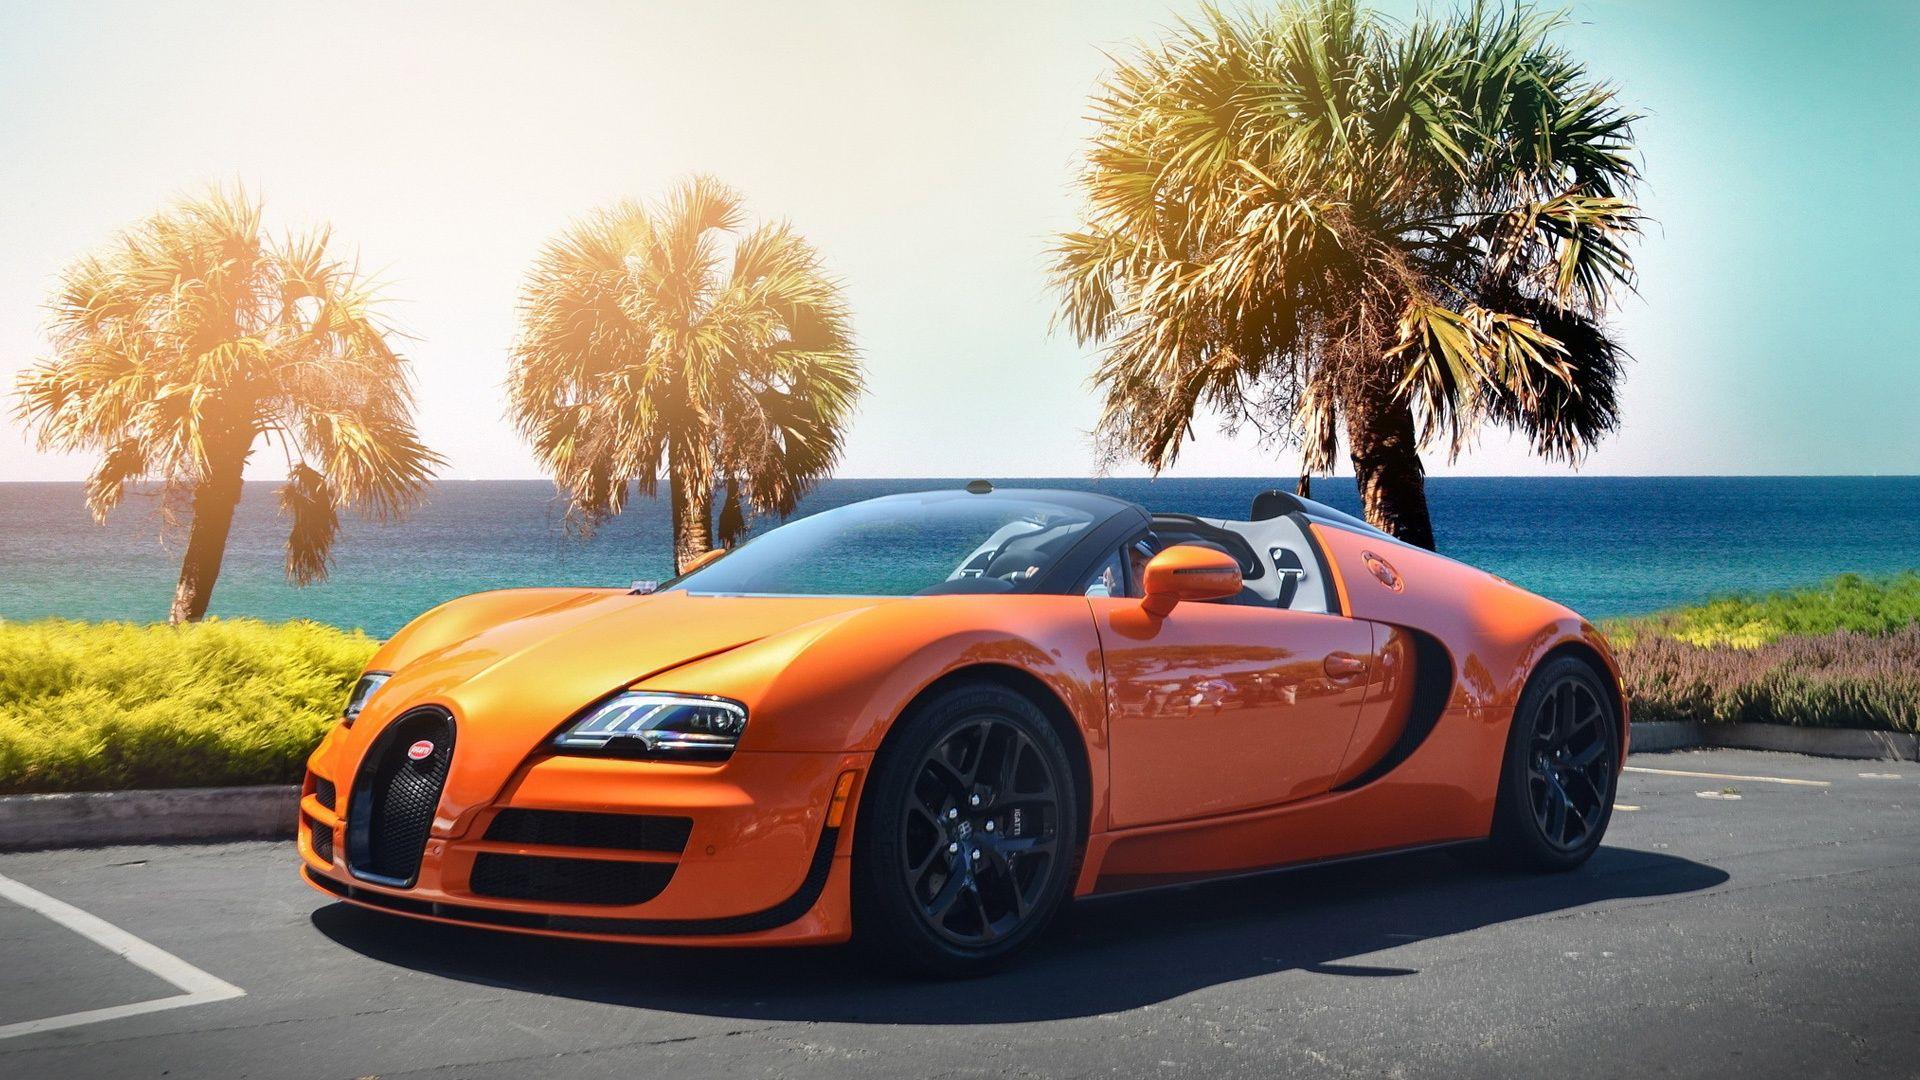 dedea55804a1622b7df4f808af1b1687 Astounding Bugatti Veyron Grand Sport Vitesse Geschwindigkeit Cars Trend